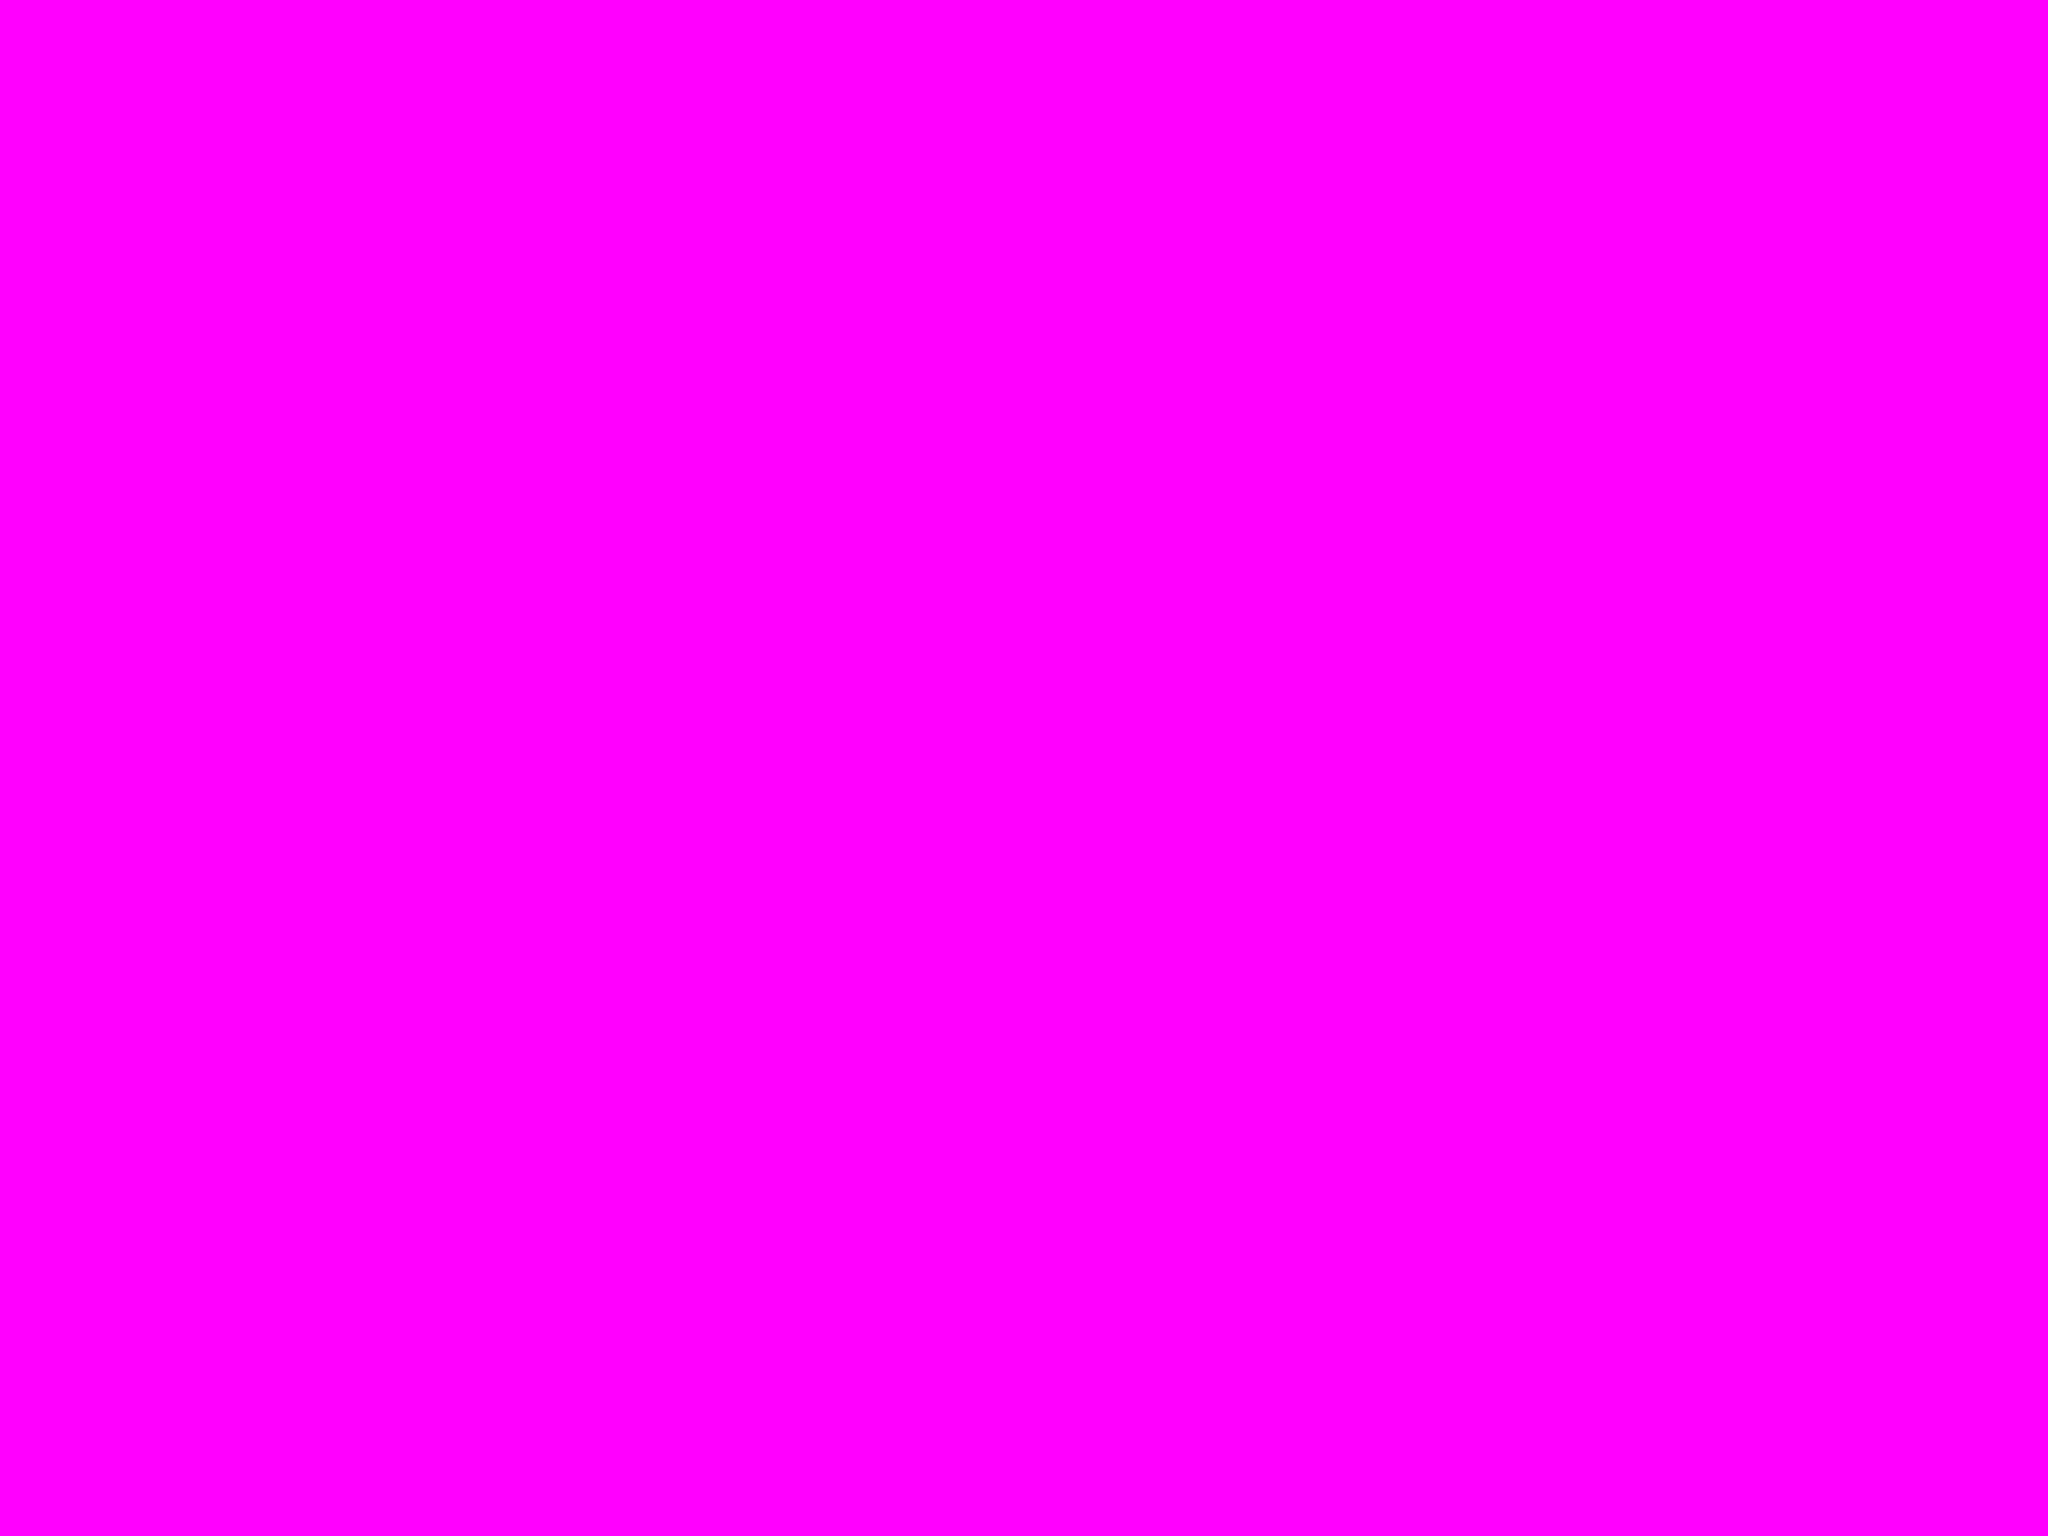 2048x1536 Magenta Solid Color Background